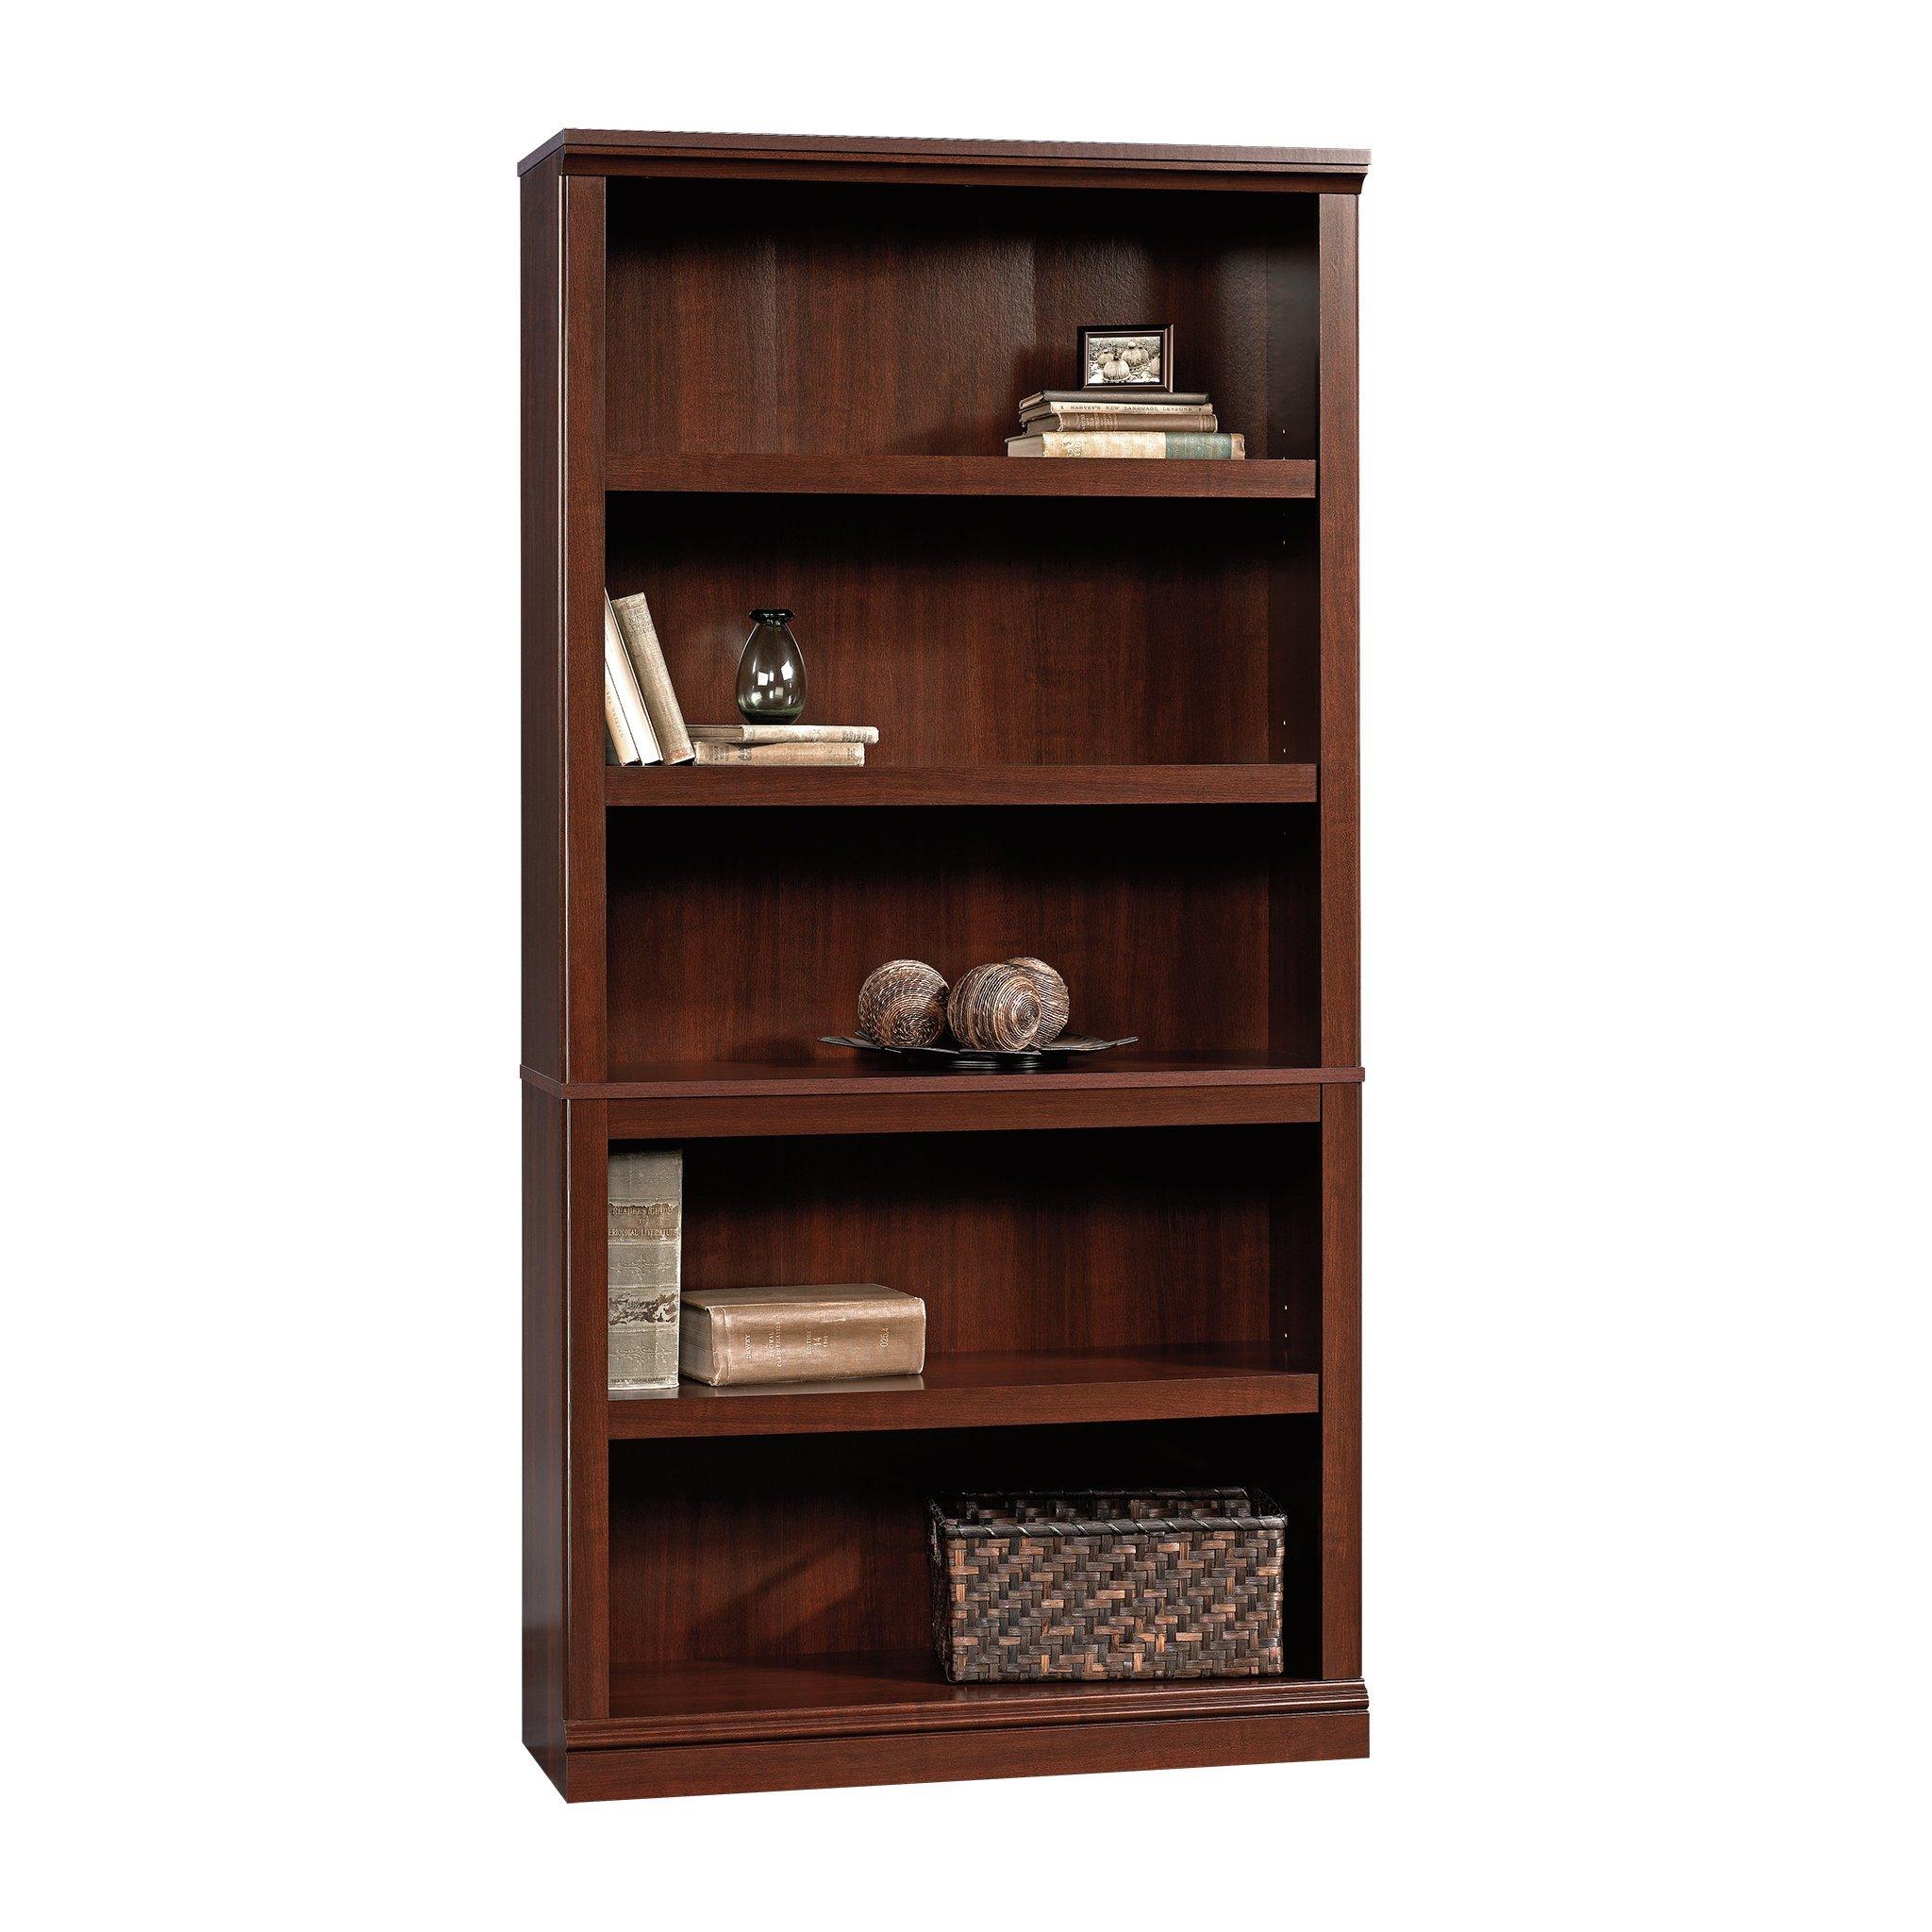 Sauder 5-Shelf Bookcase, Select Cherry Finish